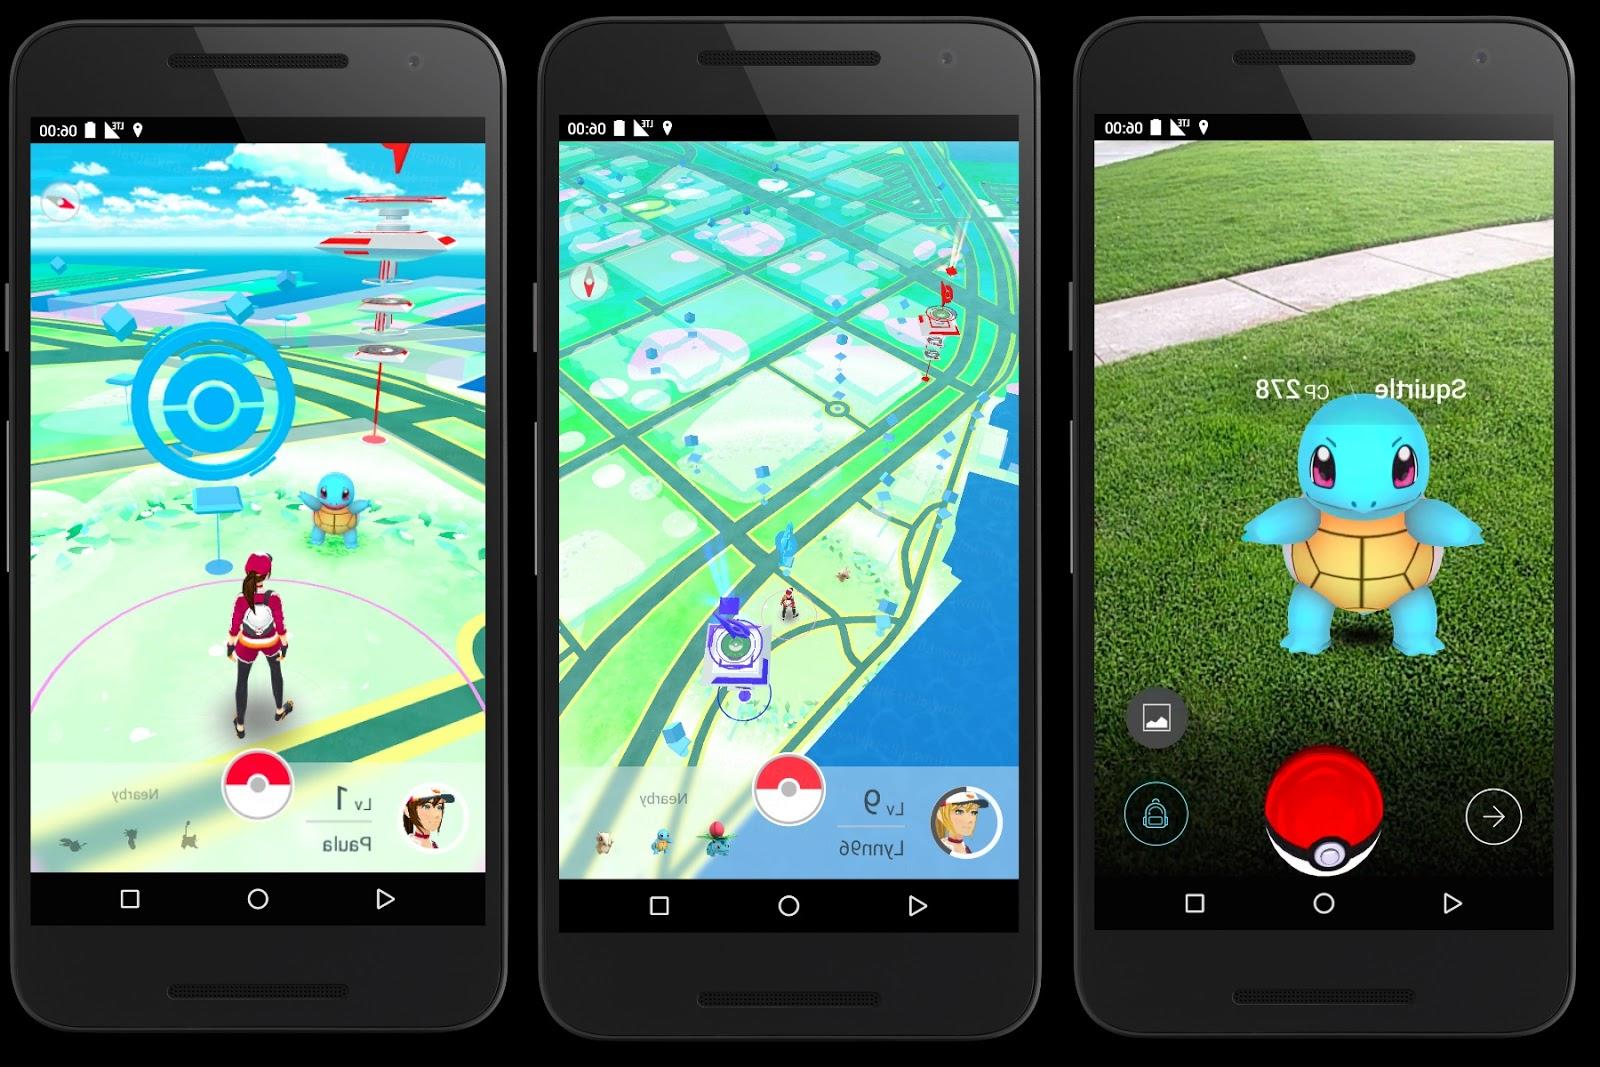 Gambar Pokemon Go Terbaru  Kumpulan Gambar